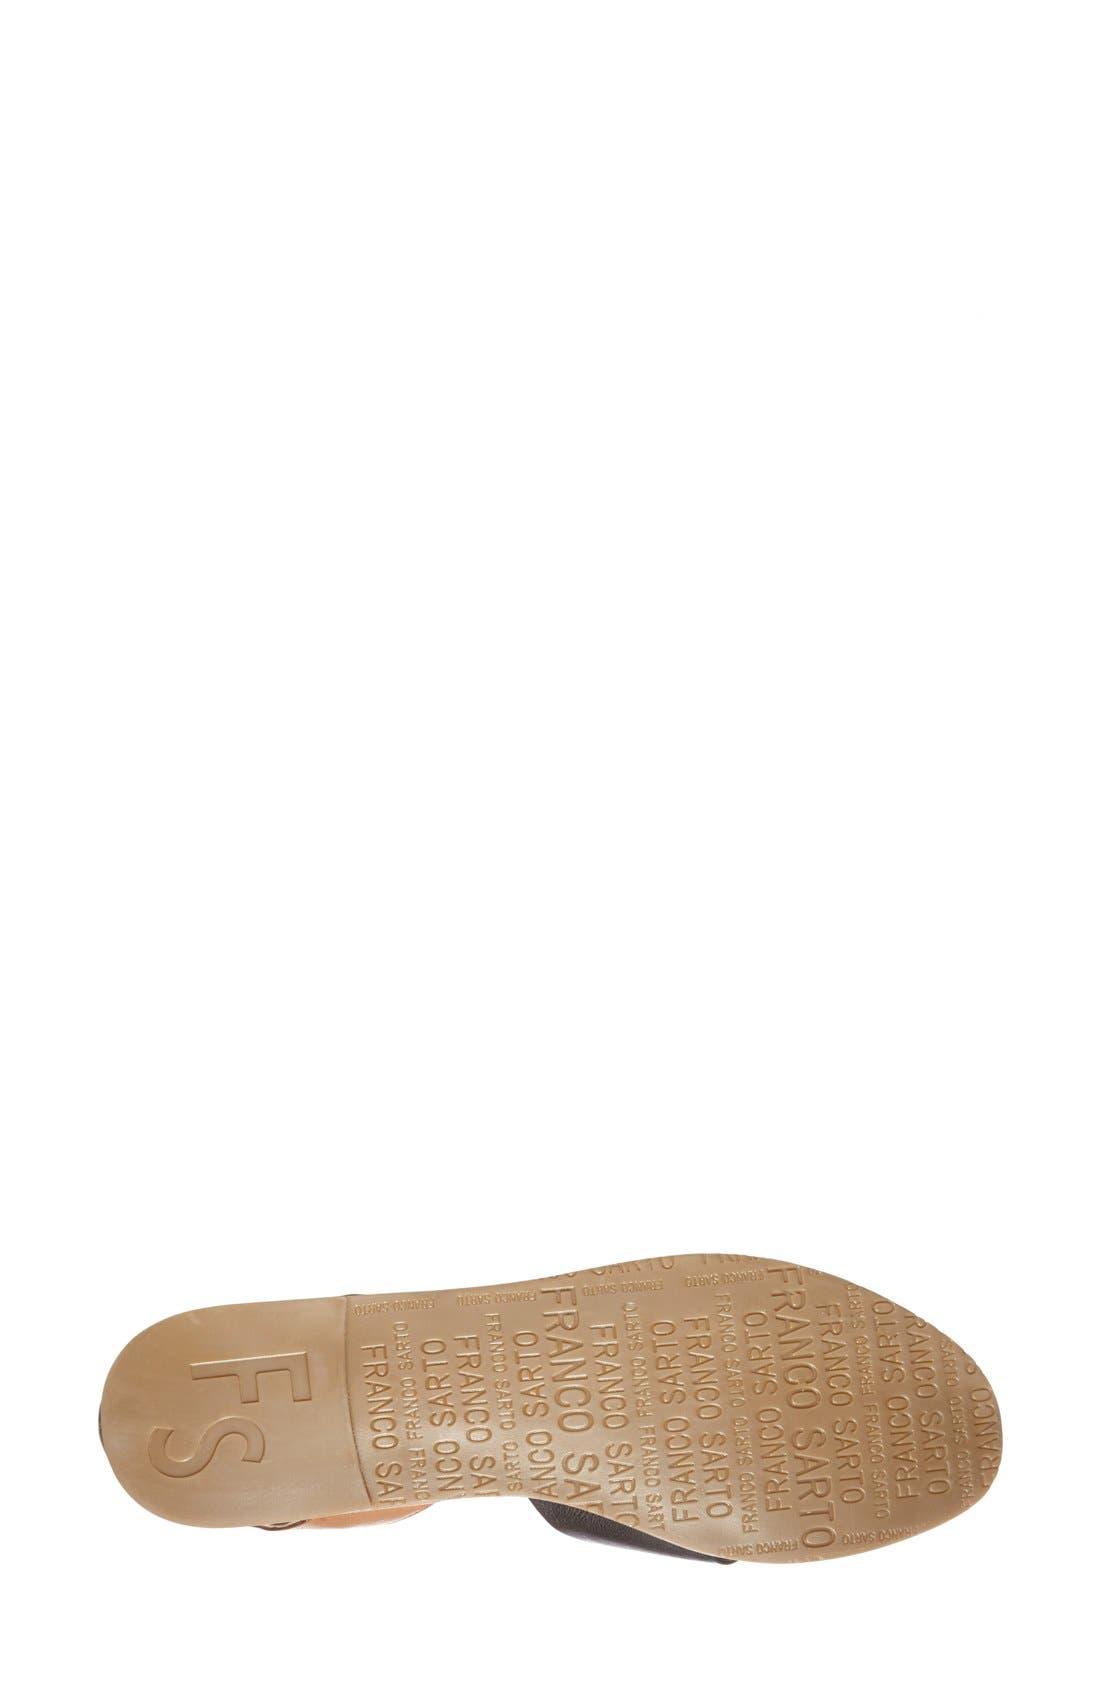 'Vivace' Leather d'Orsay Flat,                             Alternate thumbnail 2, color,                             002